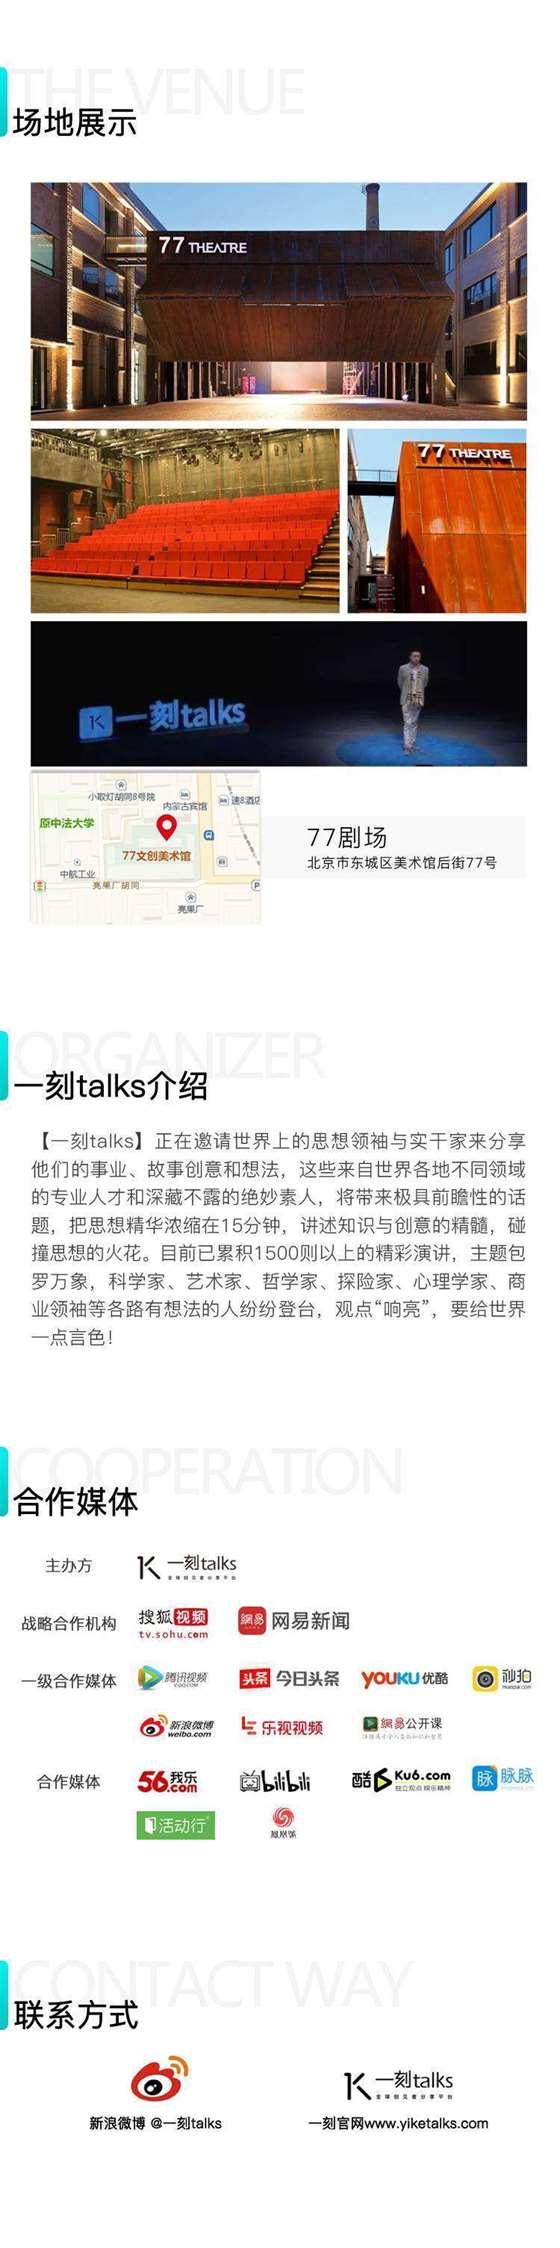 app-store详情页_04.jpg